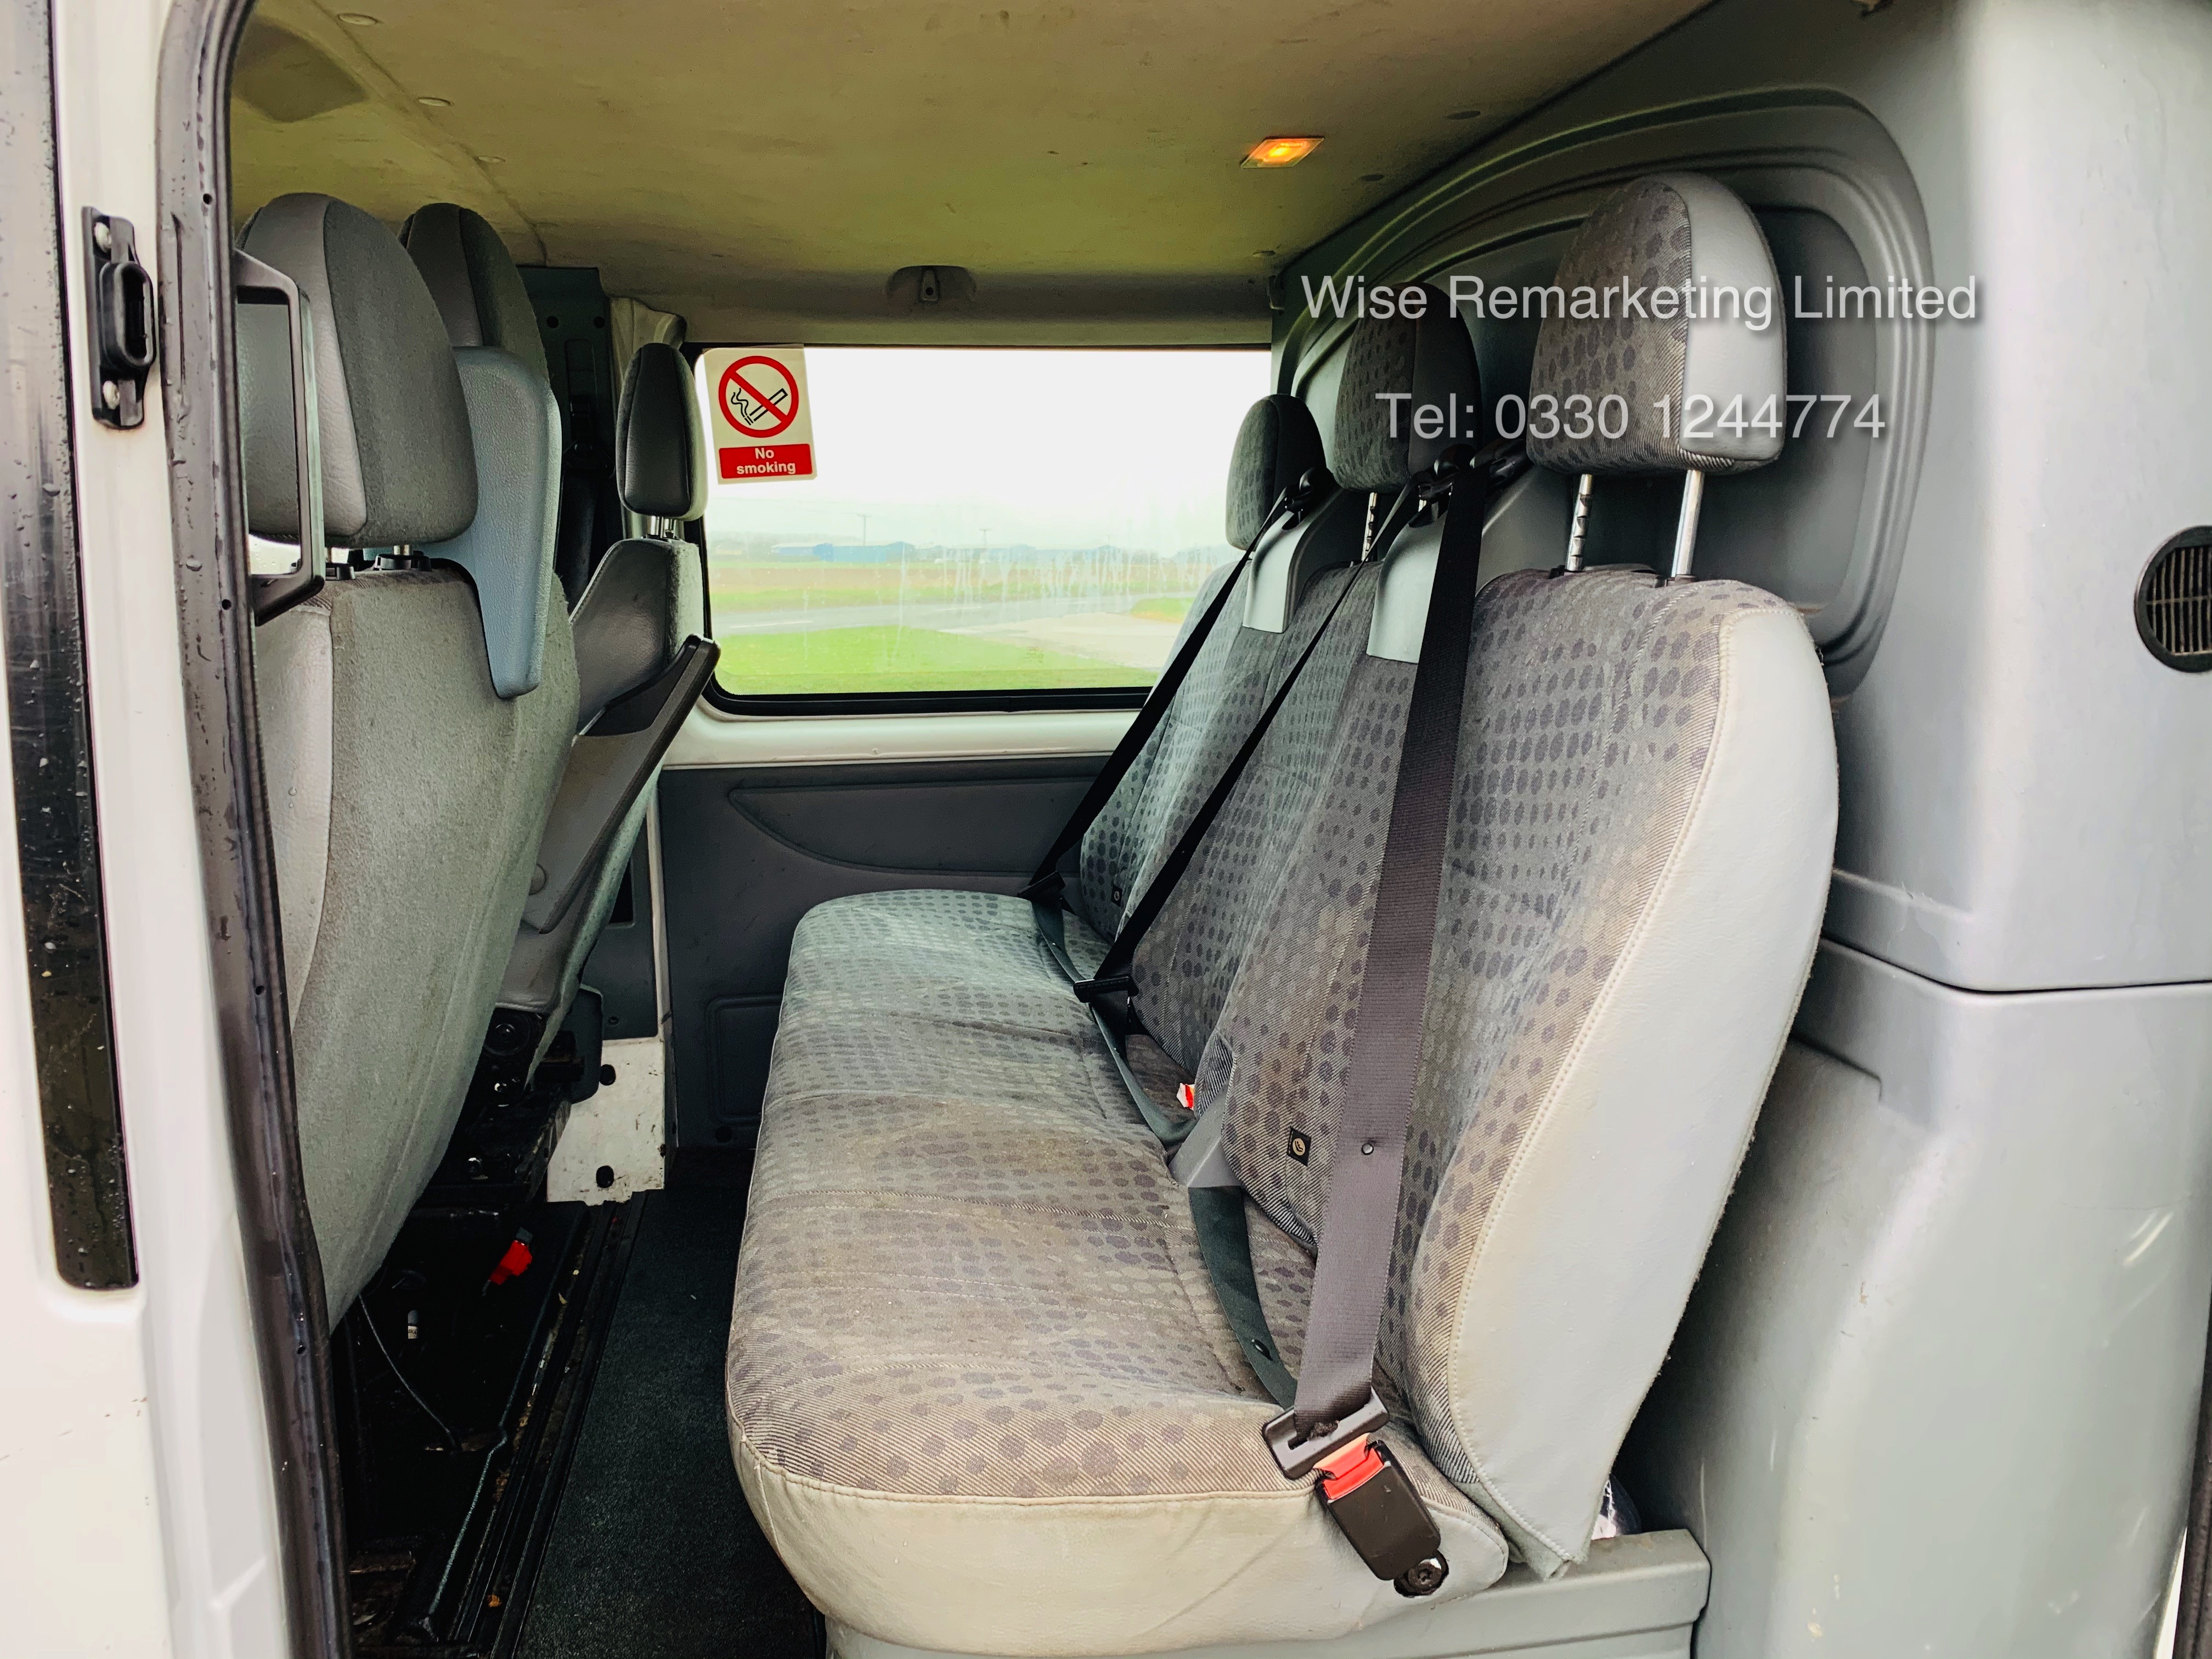 (RESERVE MET) Ford Transit T280 2.2 TDCI Dualliner Crew Van (6 Seater) - 2012 Model - 1 Year MOT - Image 10 of 15